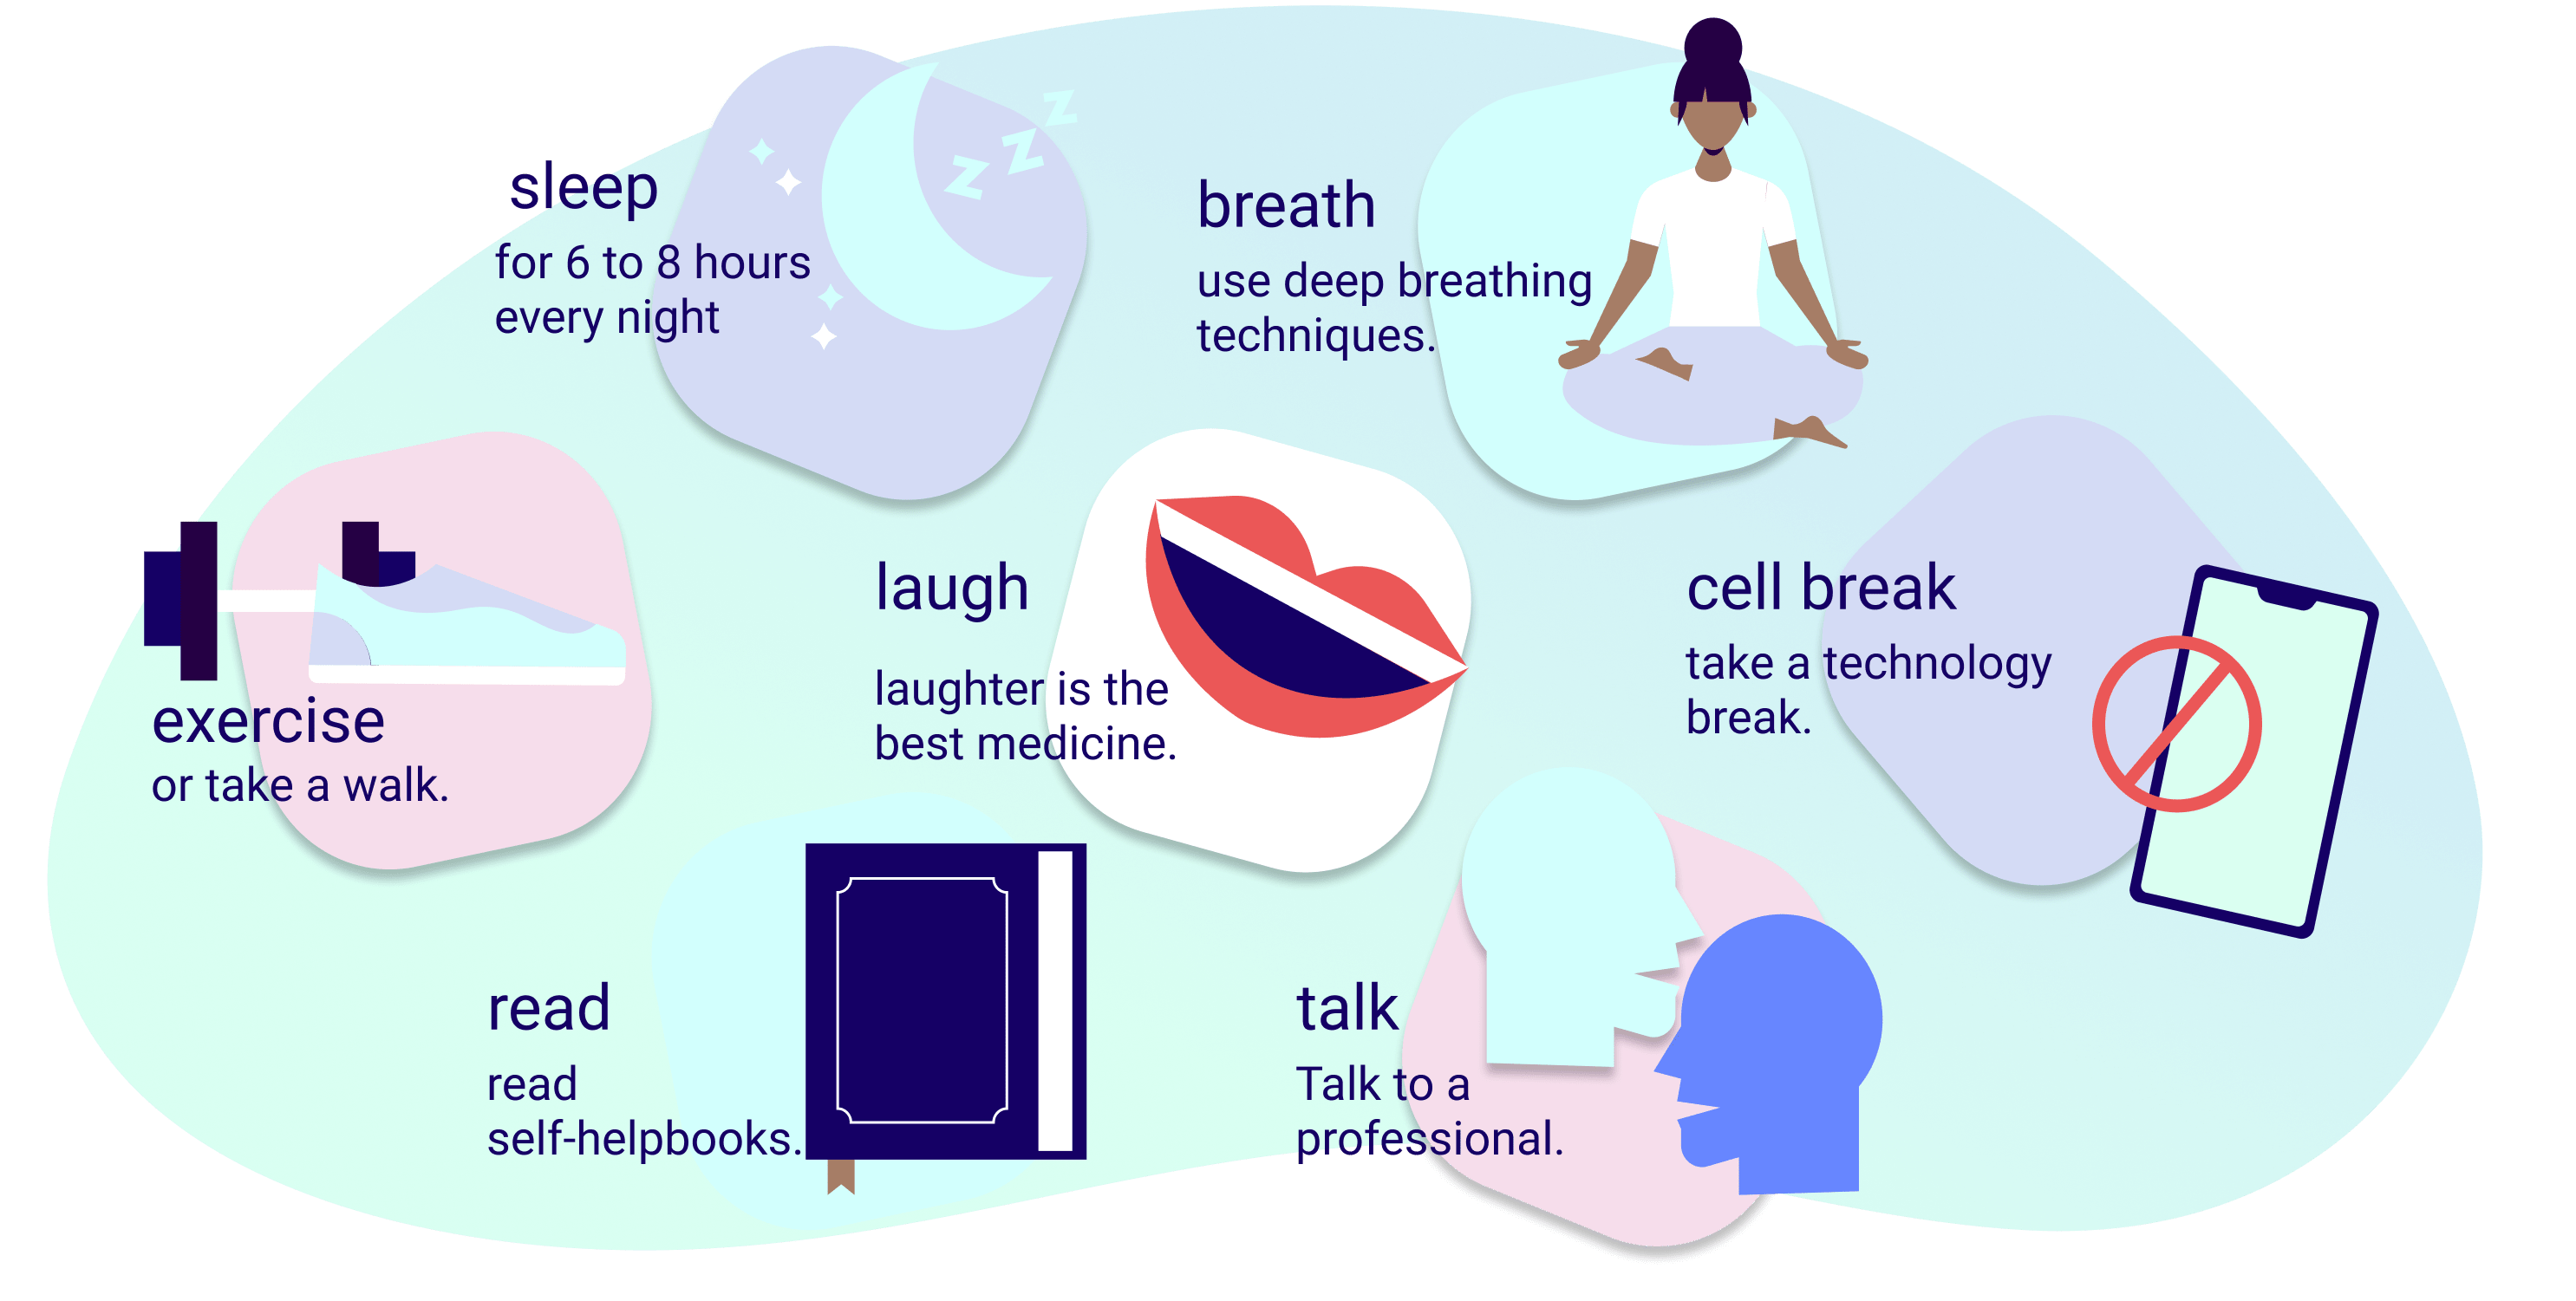 Self-care tips: sleep, breath, exercise, laugh, read, talk, break from technology